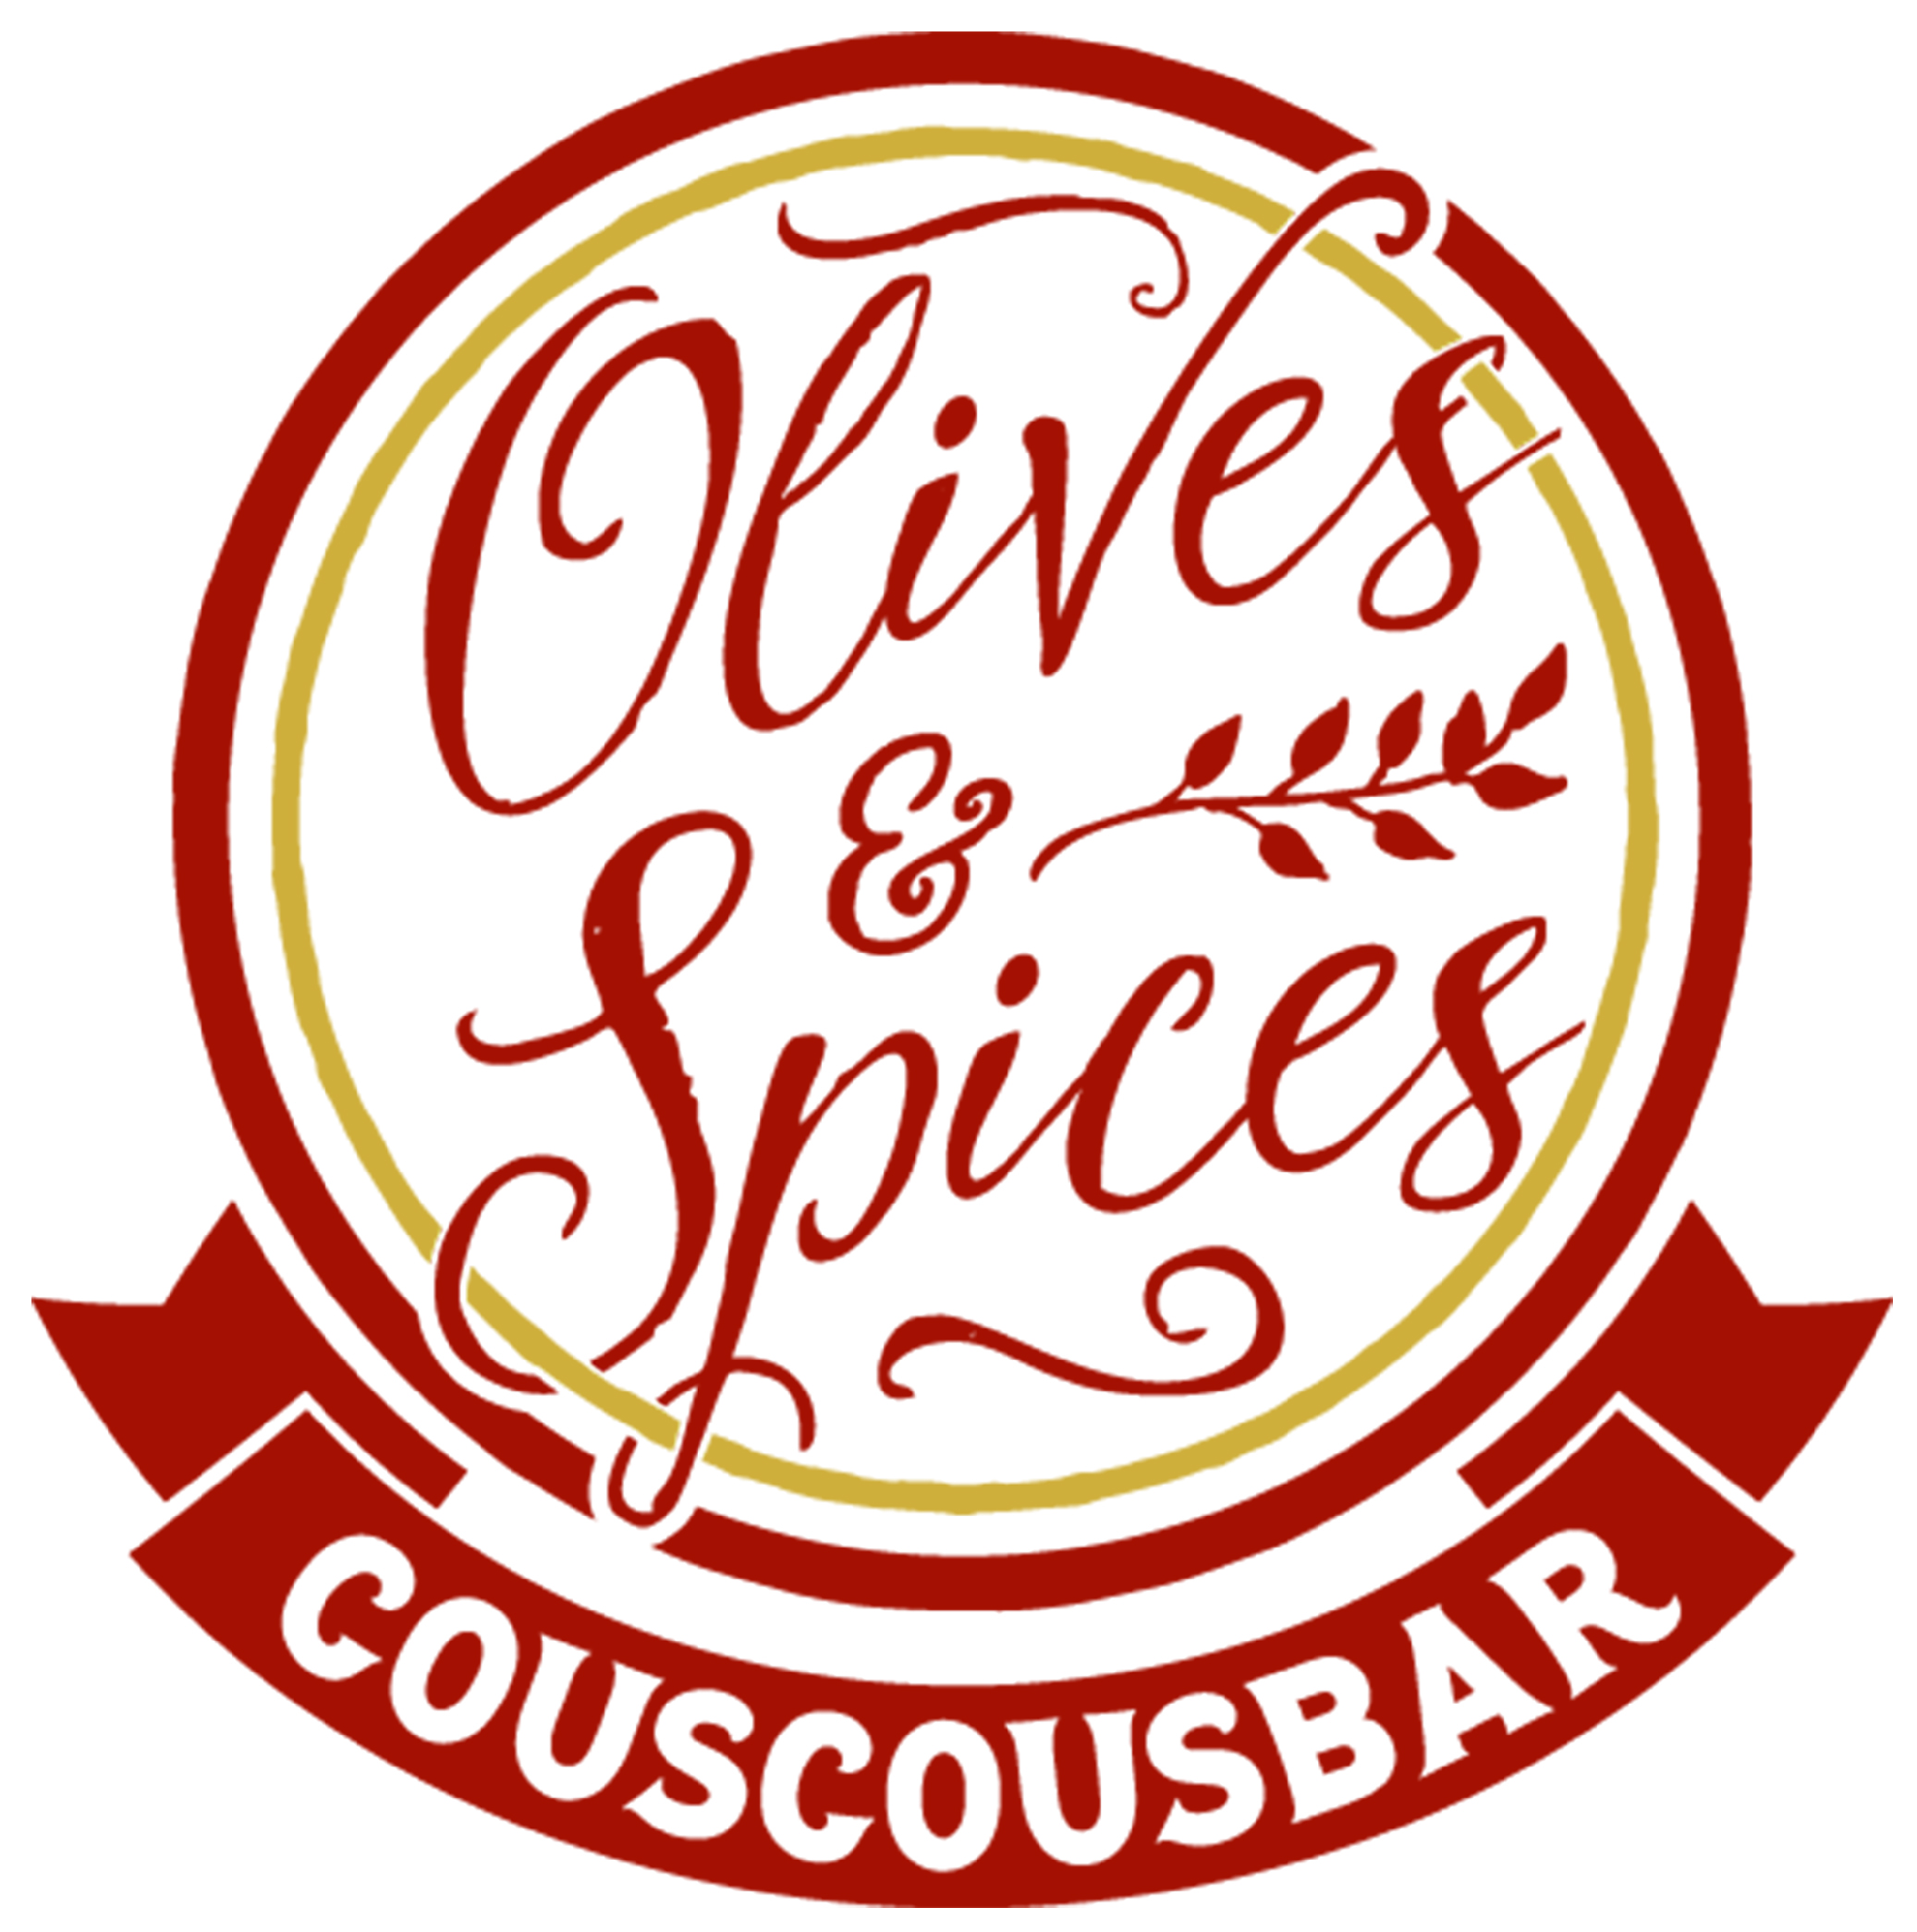 CousCousBAR